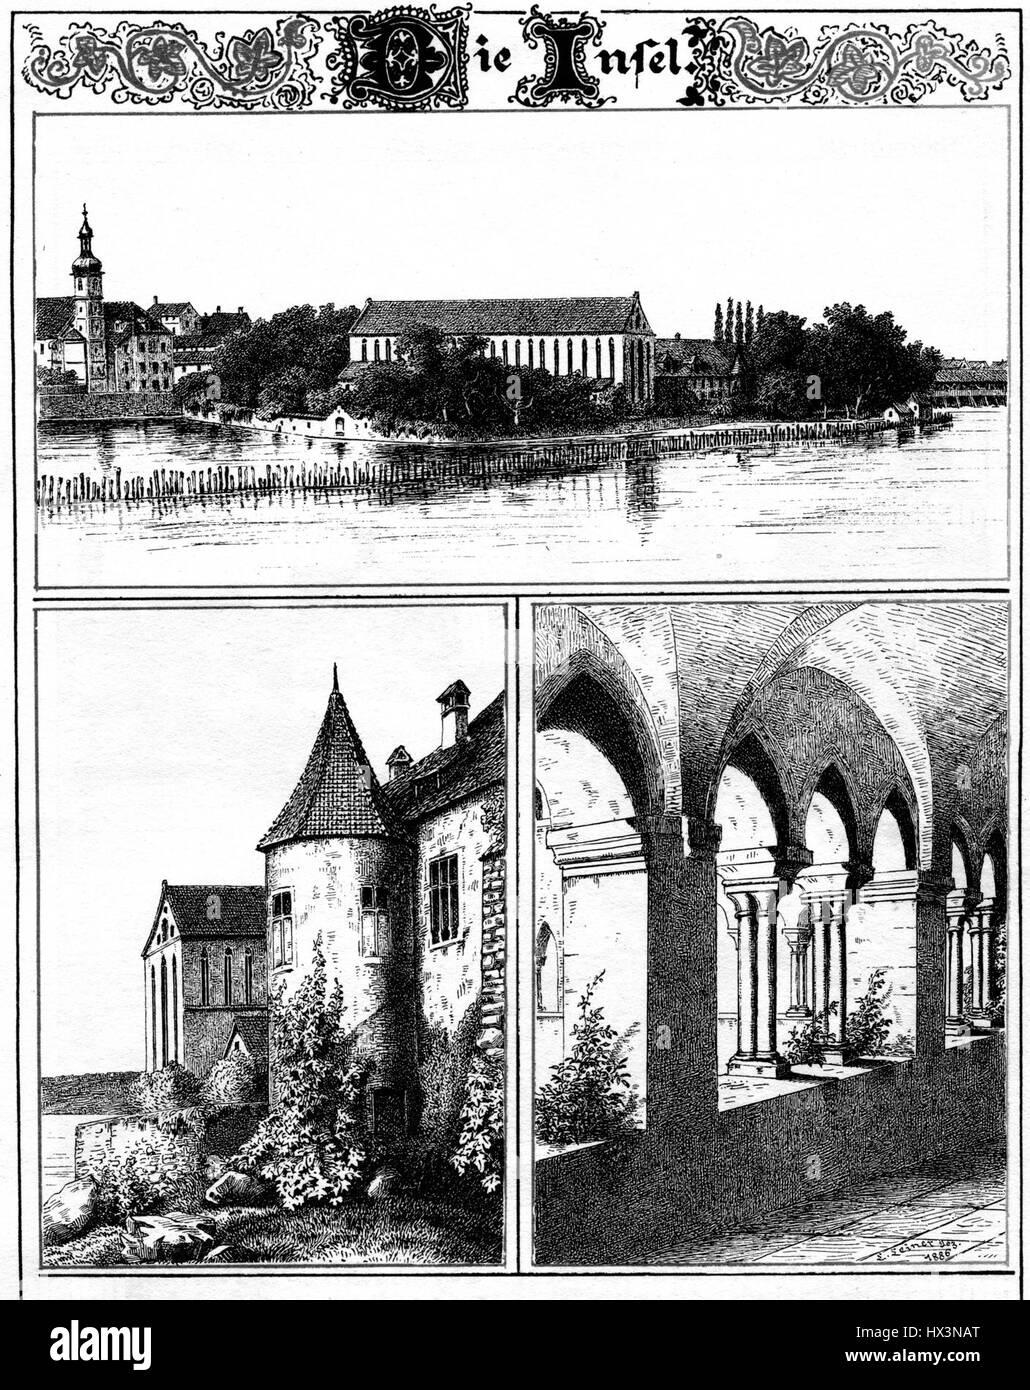 Leiner Konstanz Insel - Stock Image